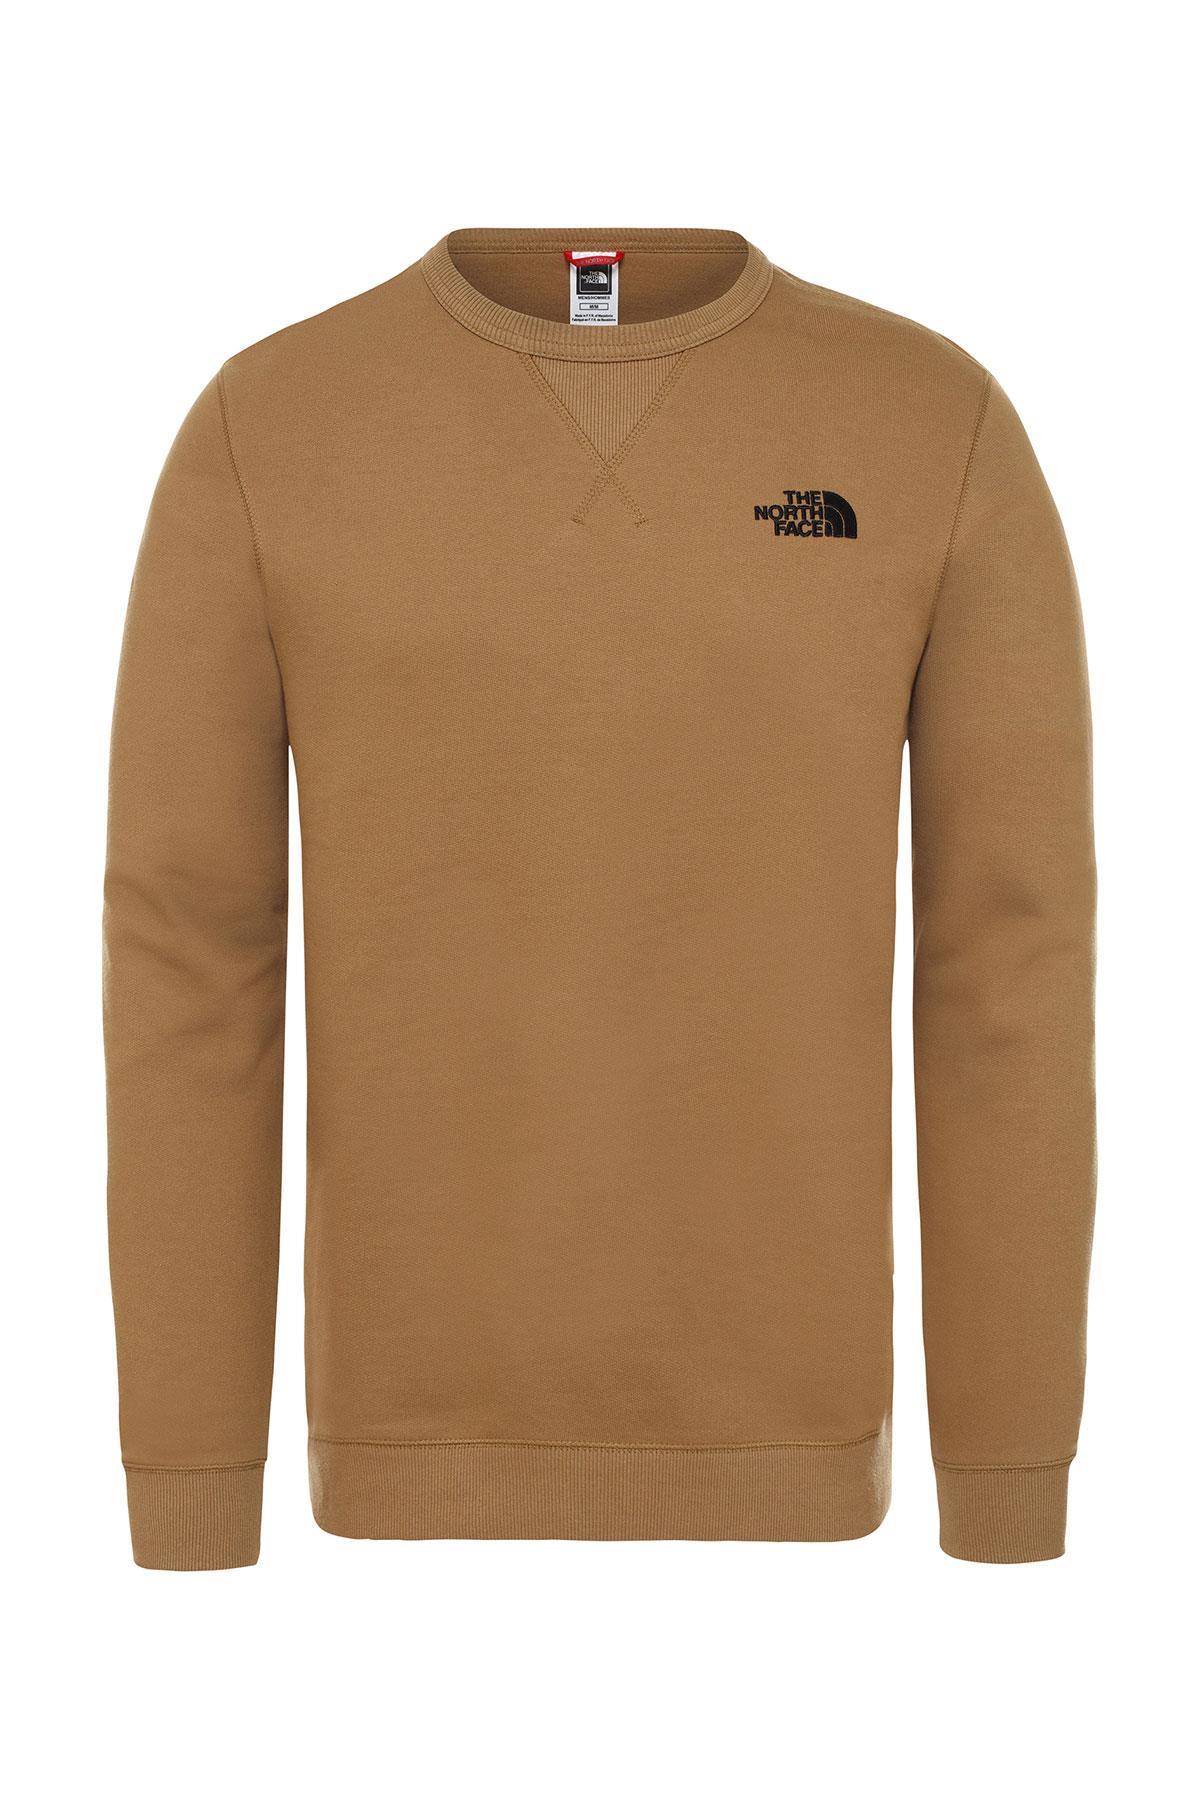 The Northface Erkek Street Fleece Pull Sweatshirt  Nf00Csn5D9V1